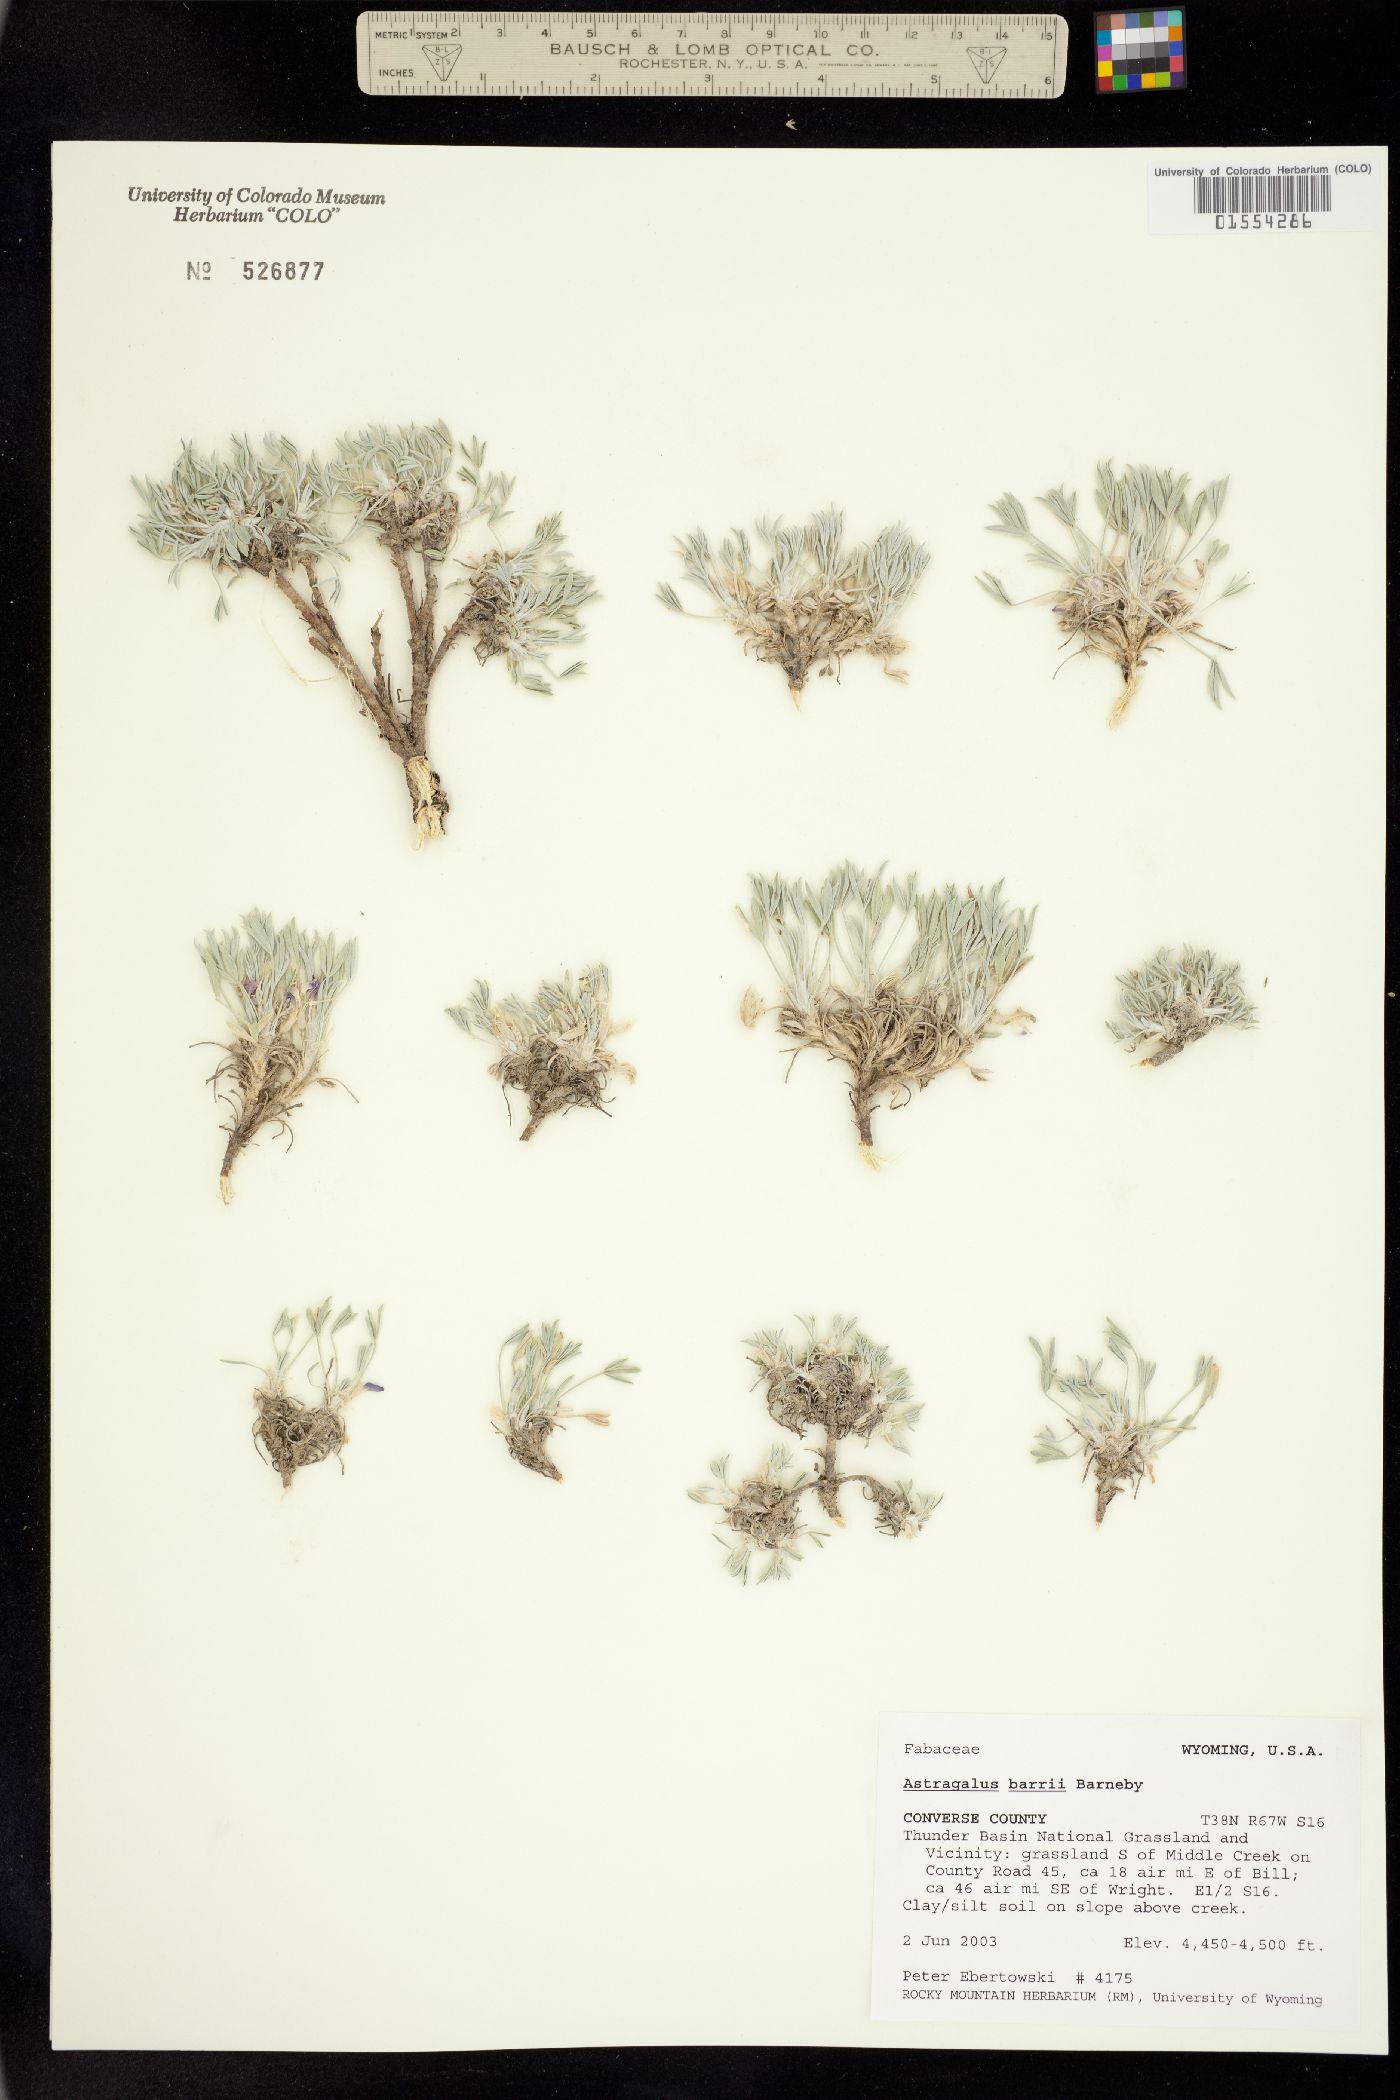 Astragalus barrii image